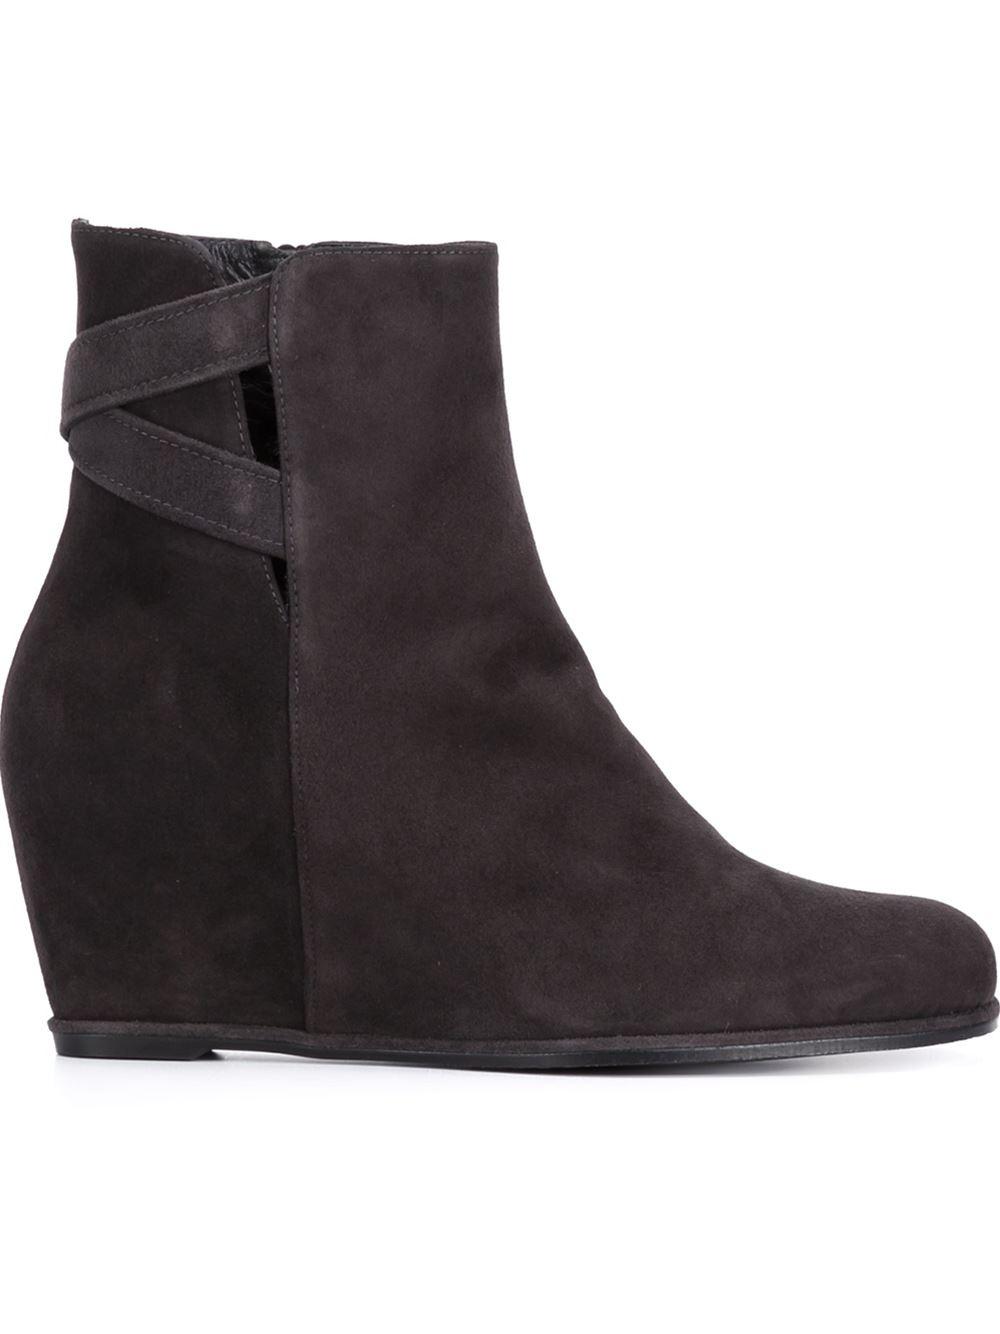 stuart weitzman fitness wedge boots in brown lyst